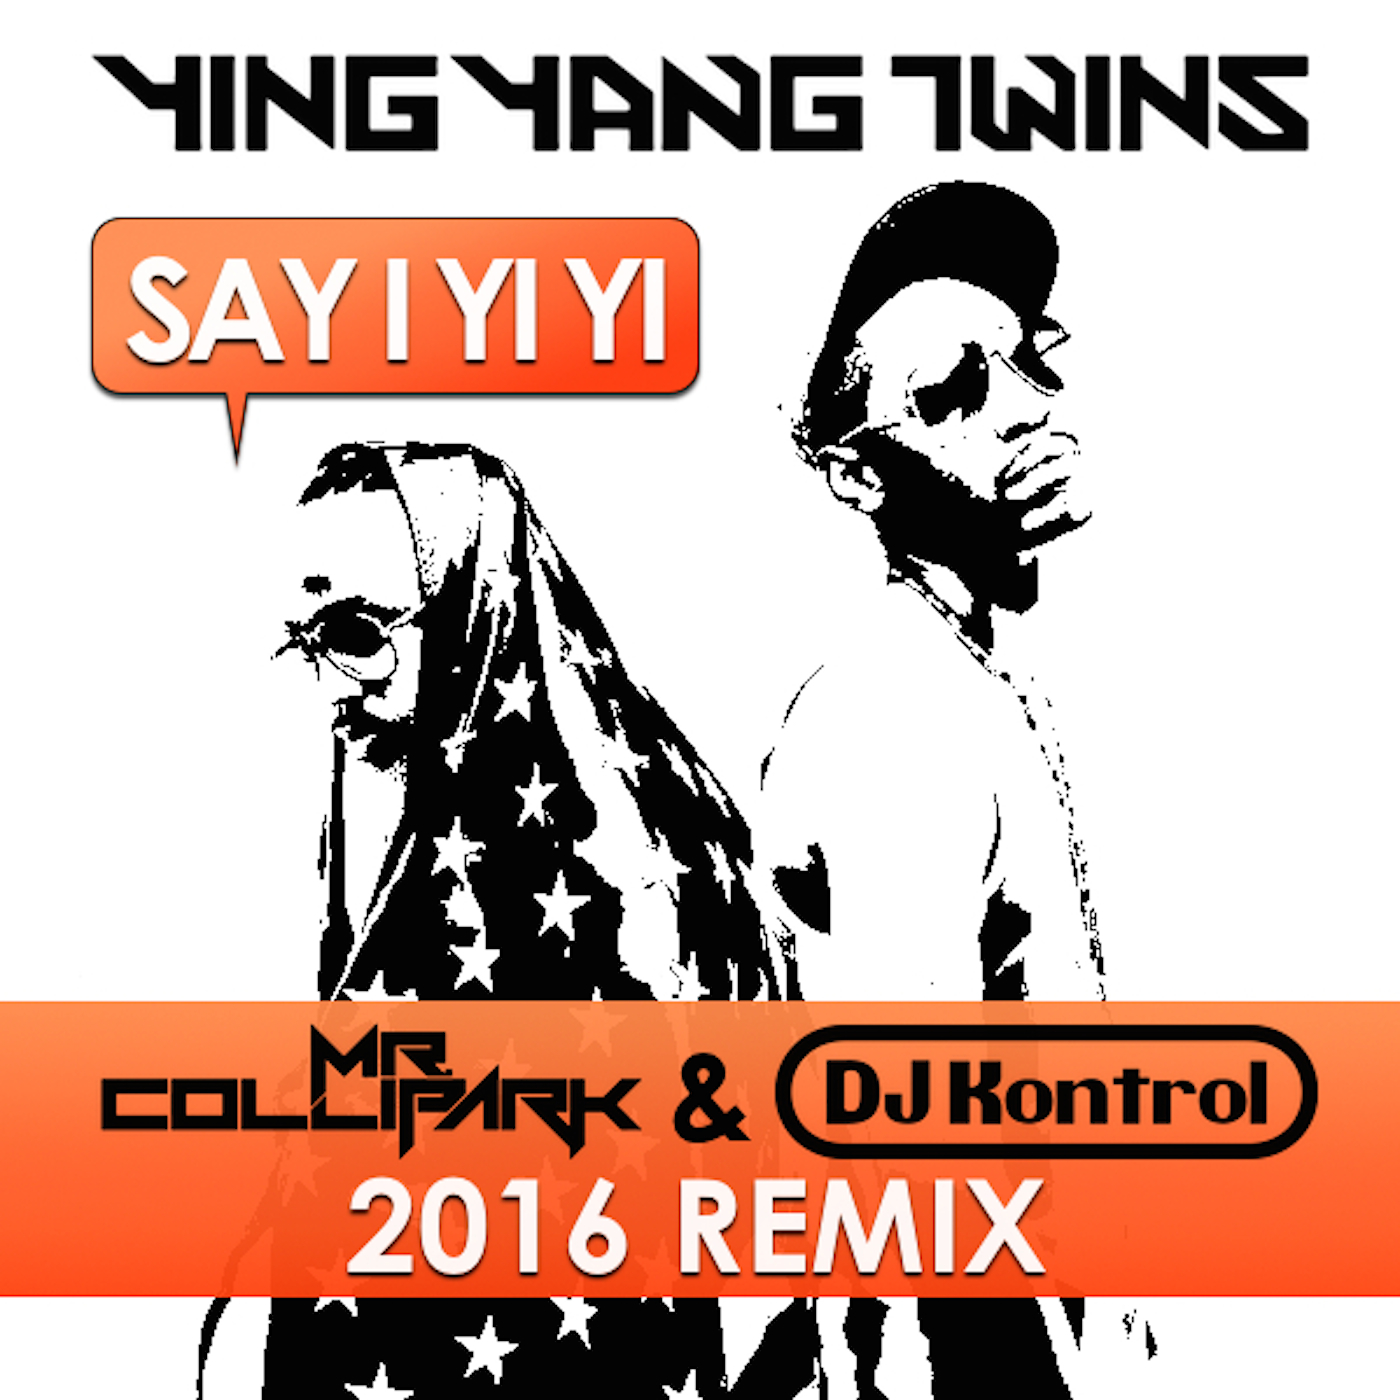 Ying Yang Twins - Say I Yi Yi (Mr. Collipark & DJ Kontrol Remix)